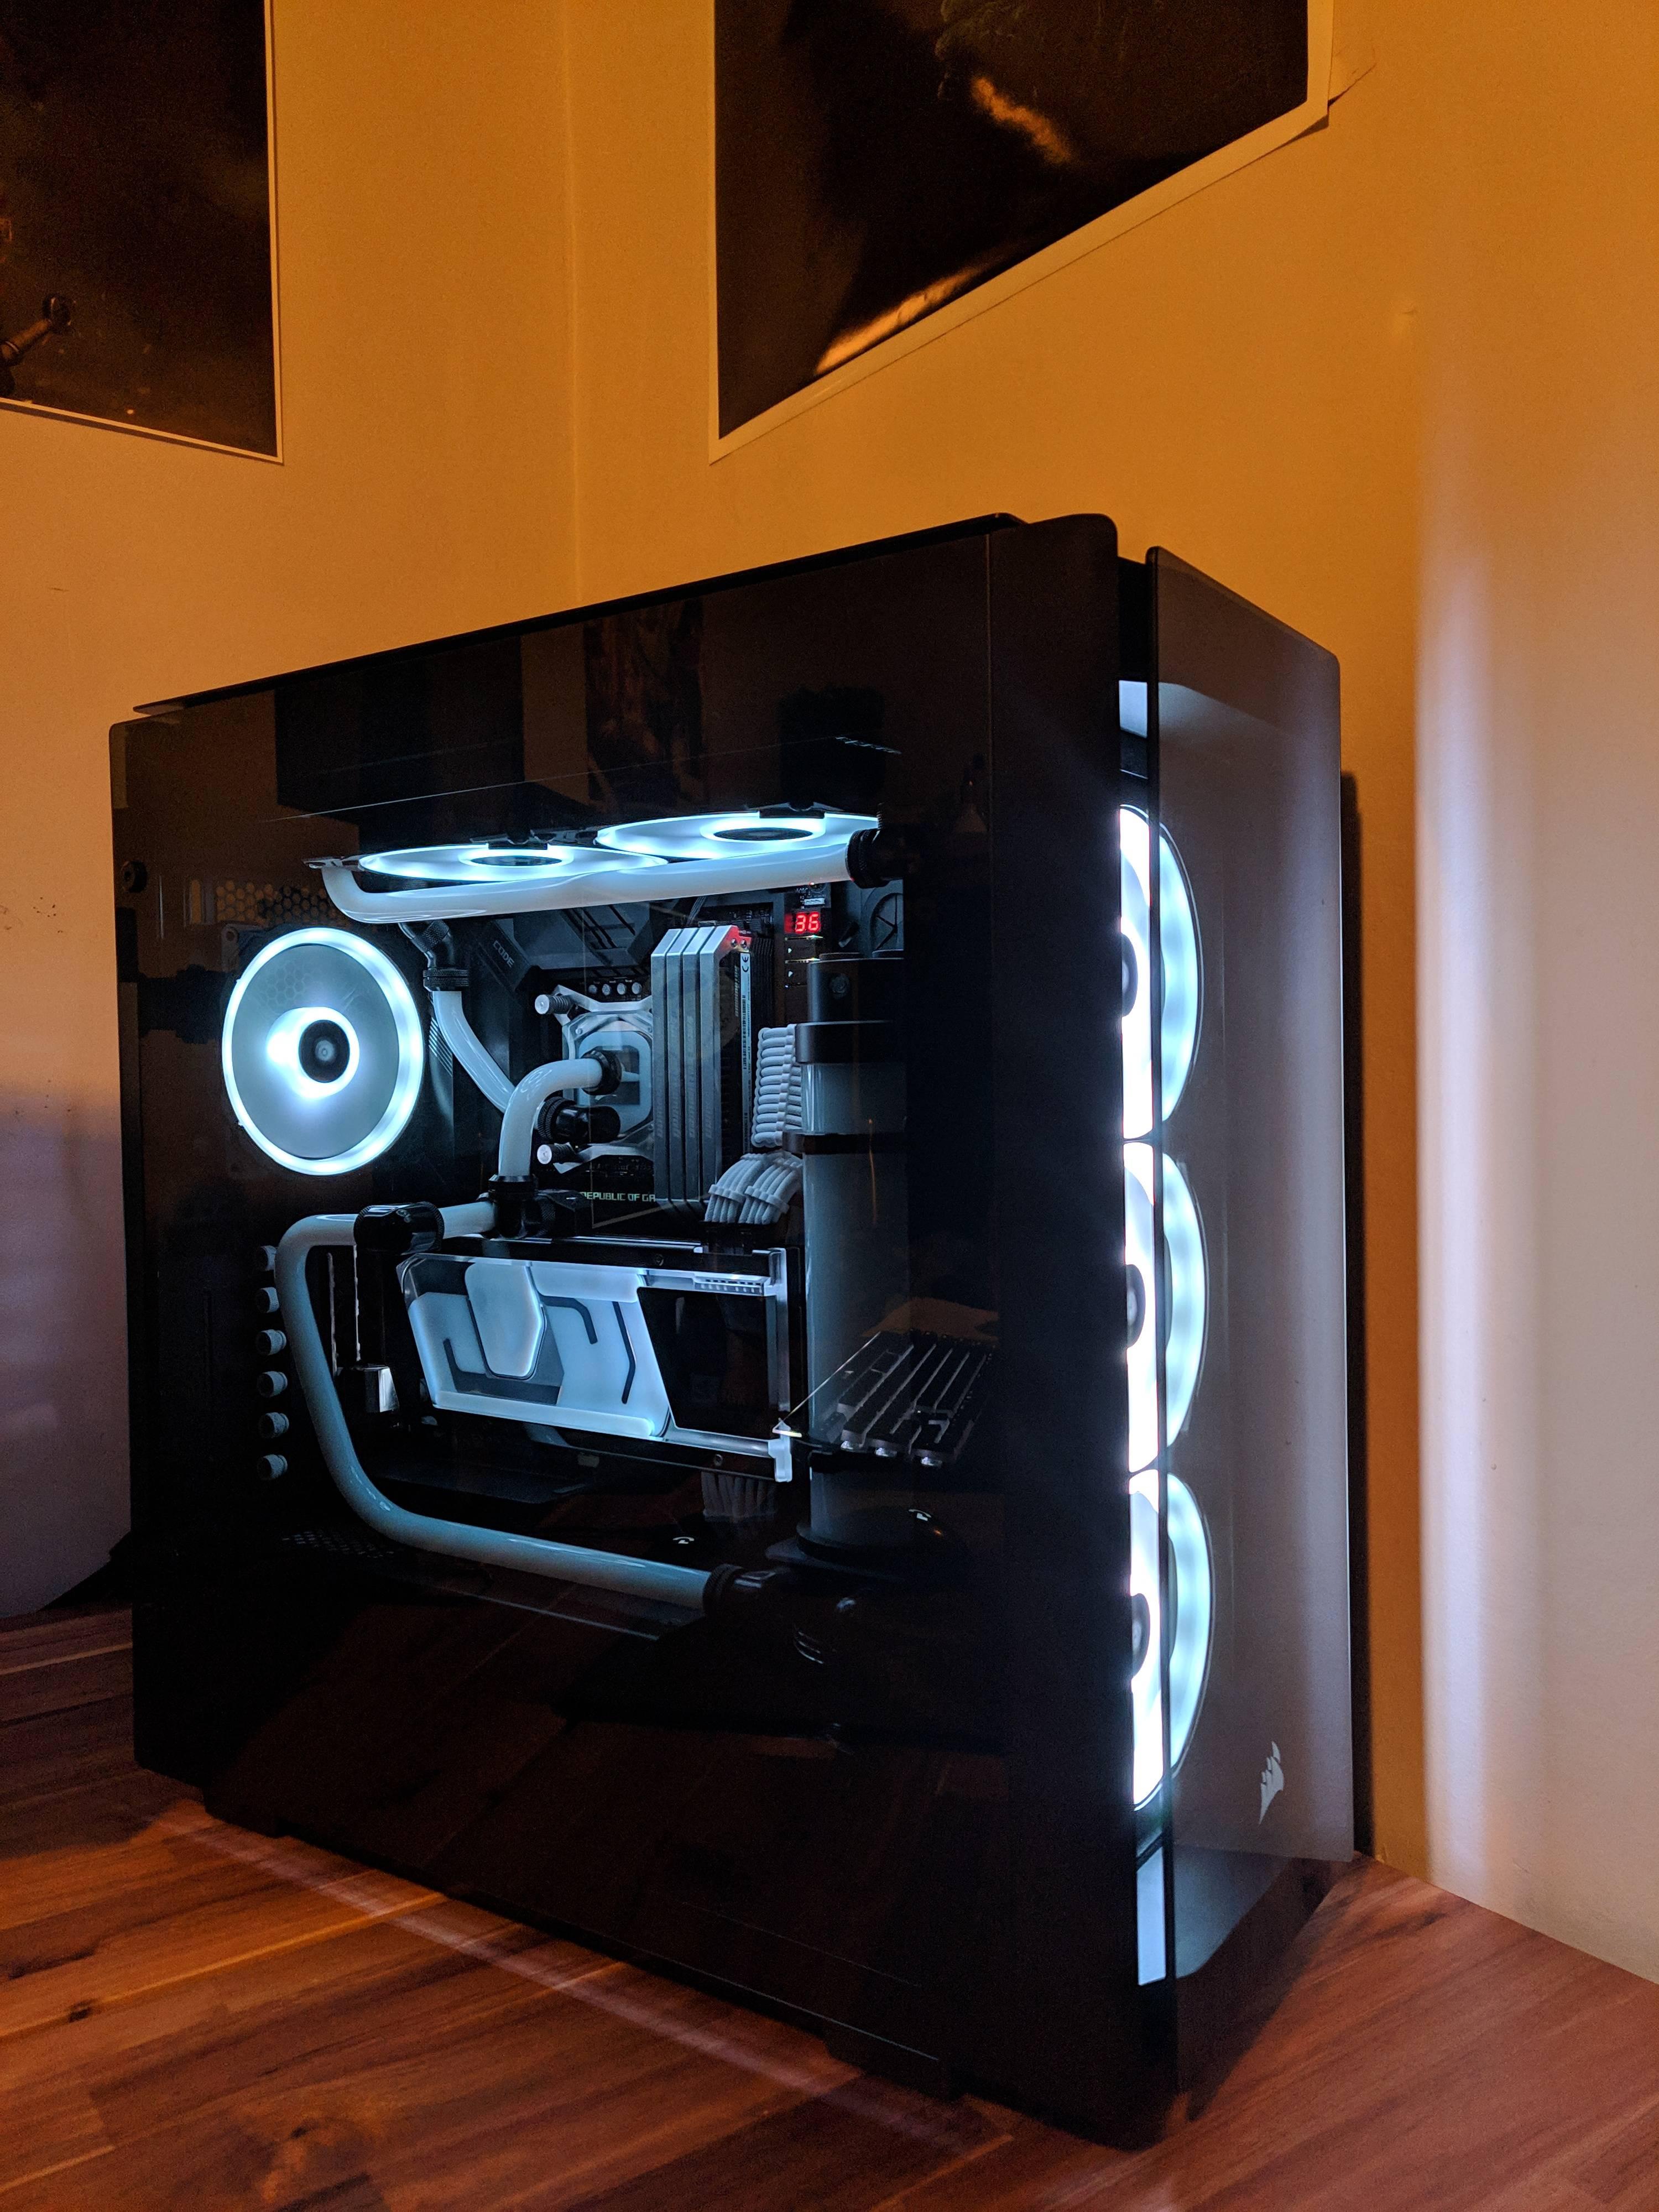 Soulshot96's Setup - 2019 Main PC - Monolith Mk. 2 | Scooget